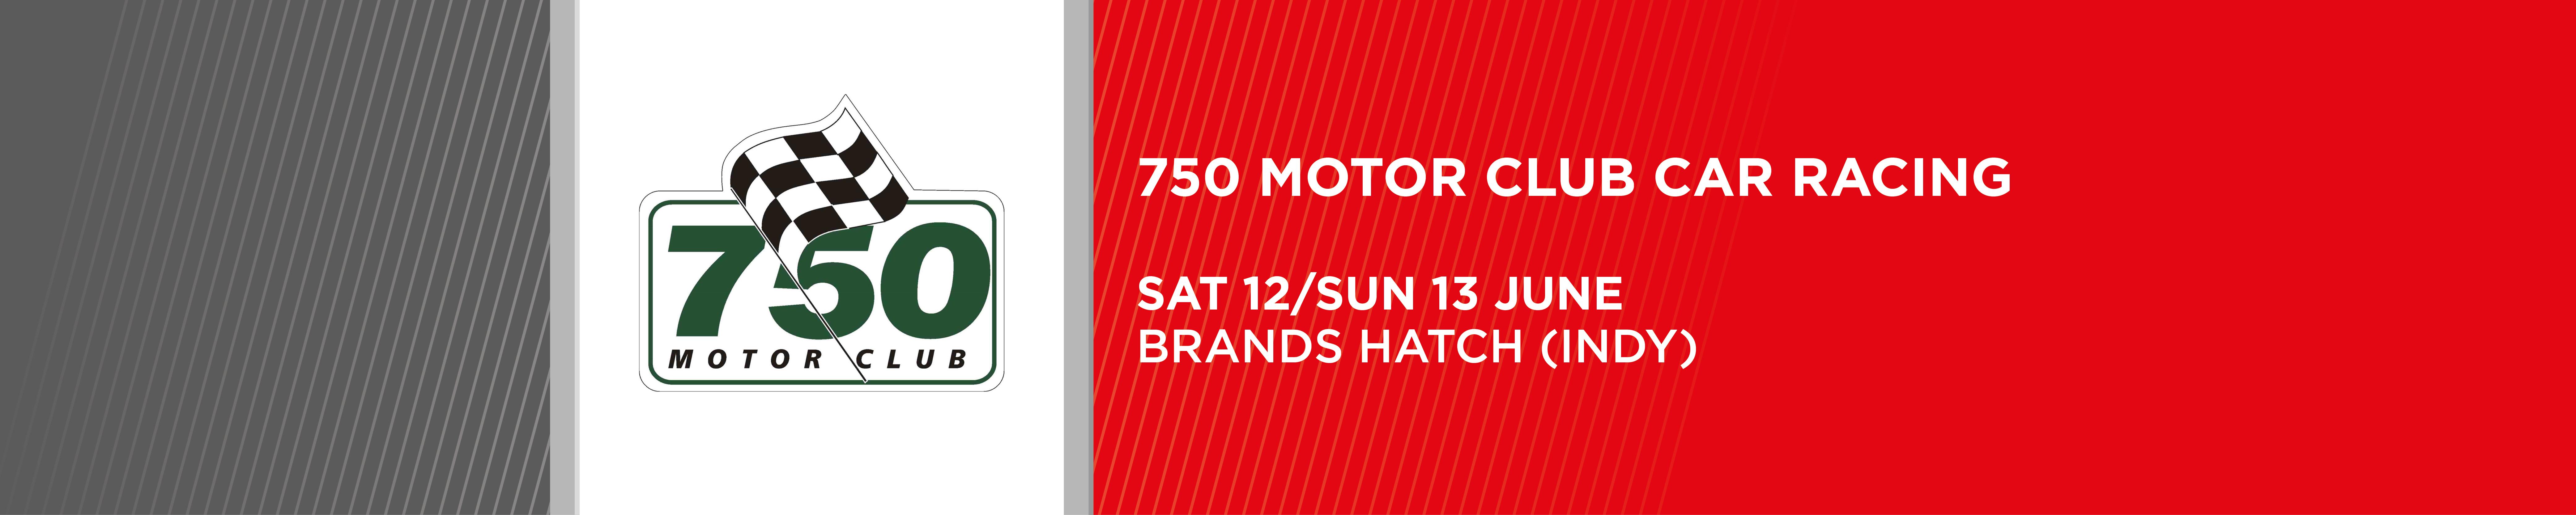 750 Motor Club Championships